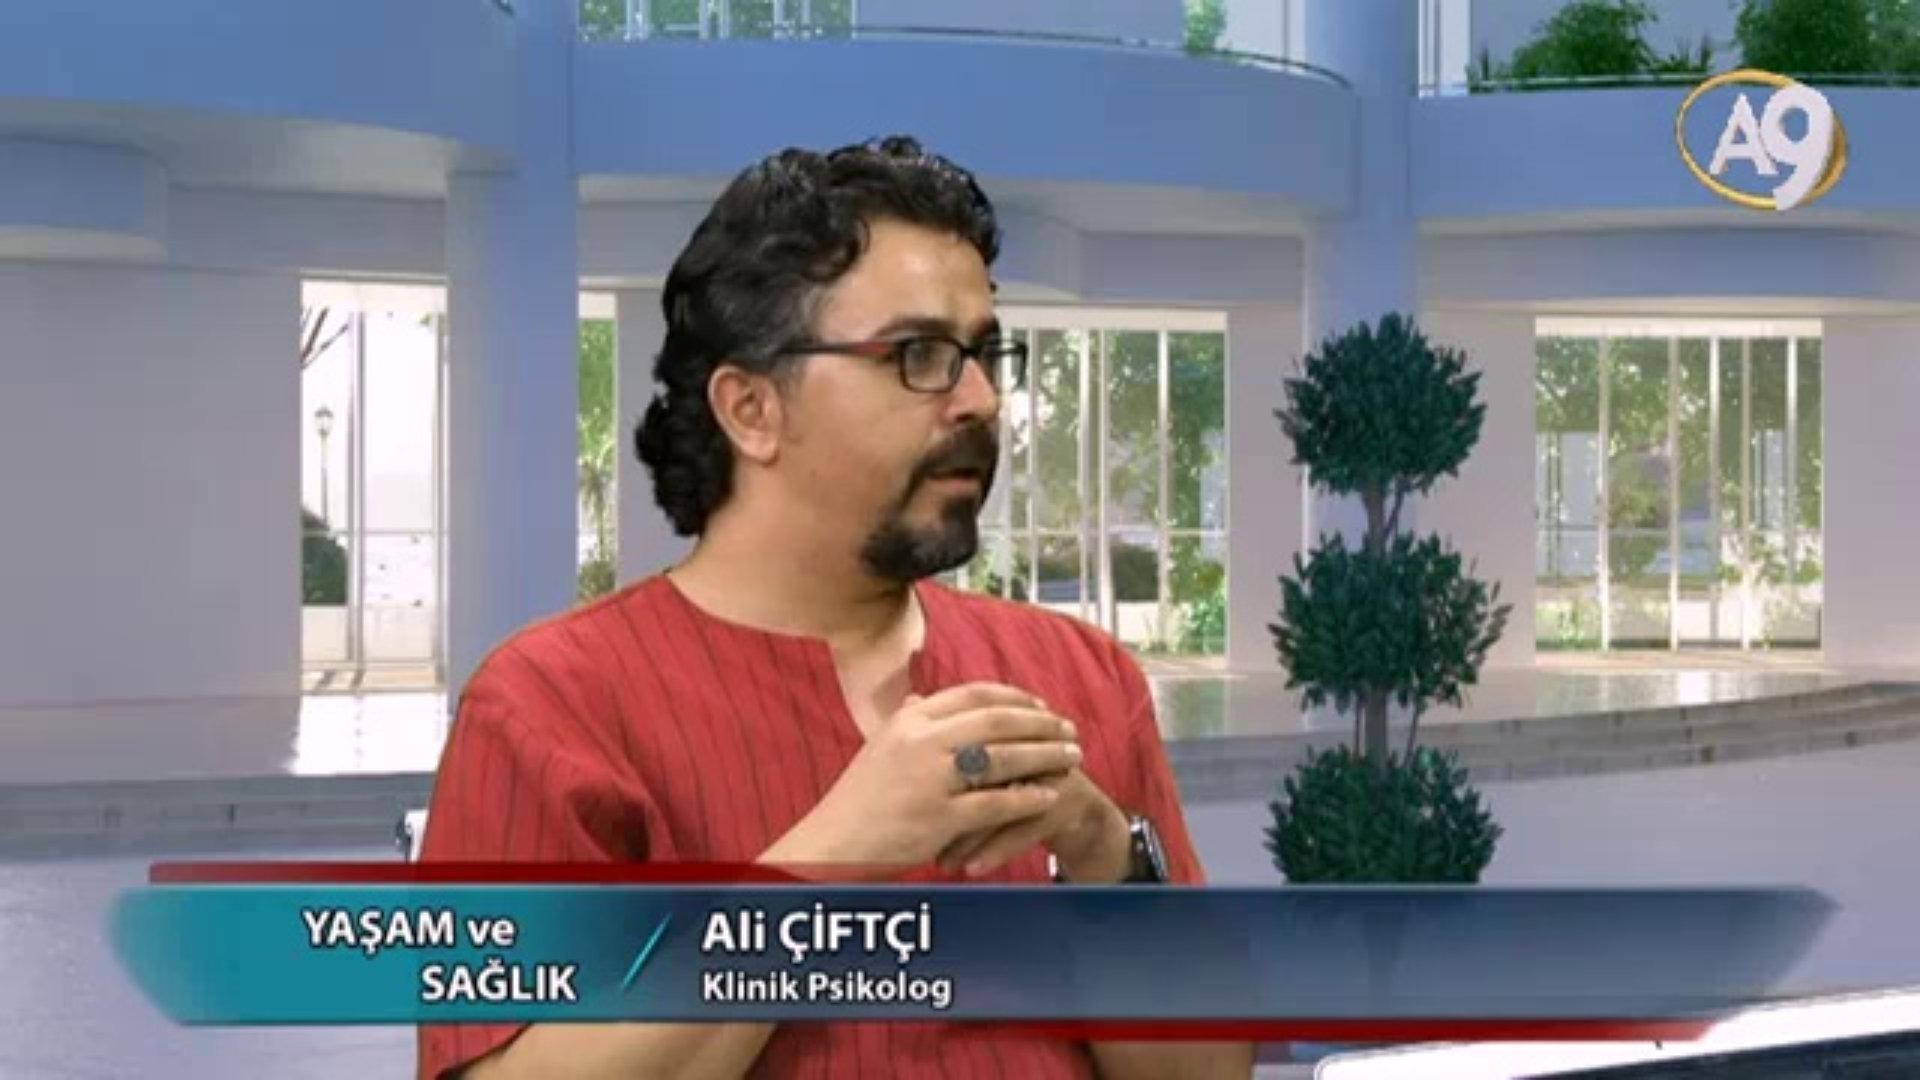 Psikolog Ali Çifçi